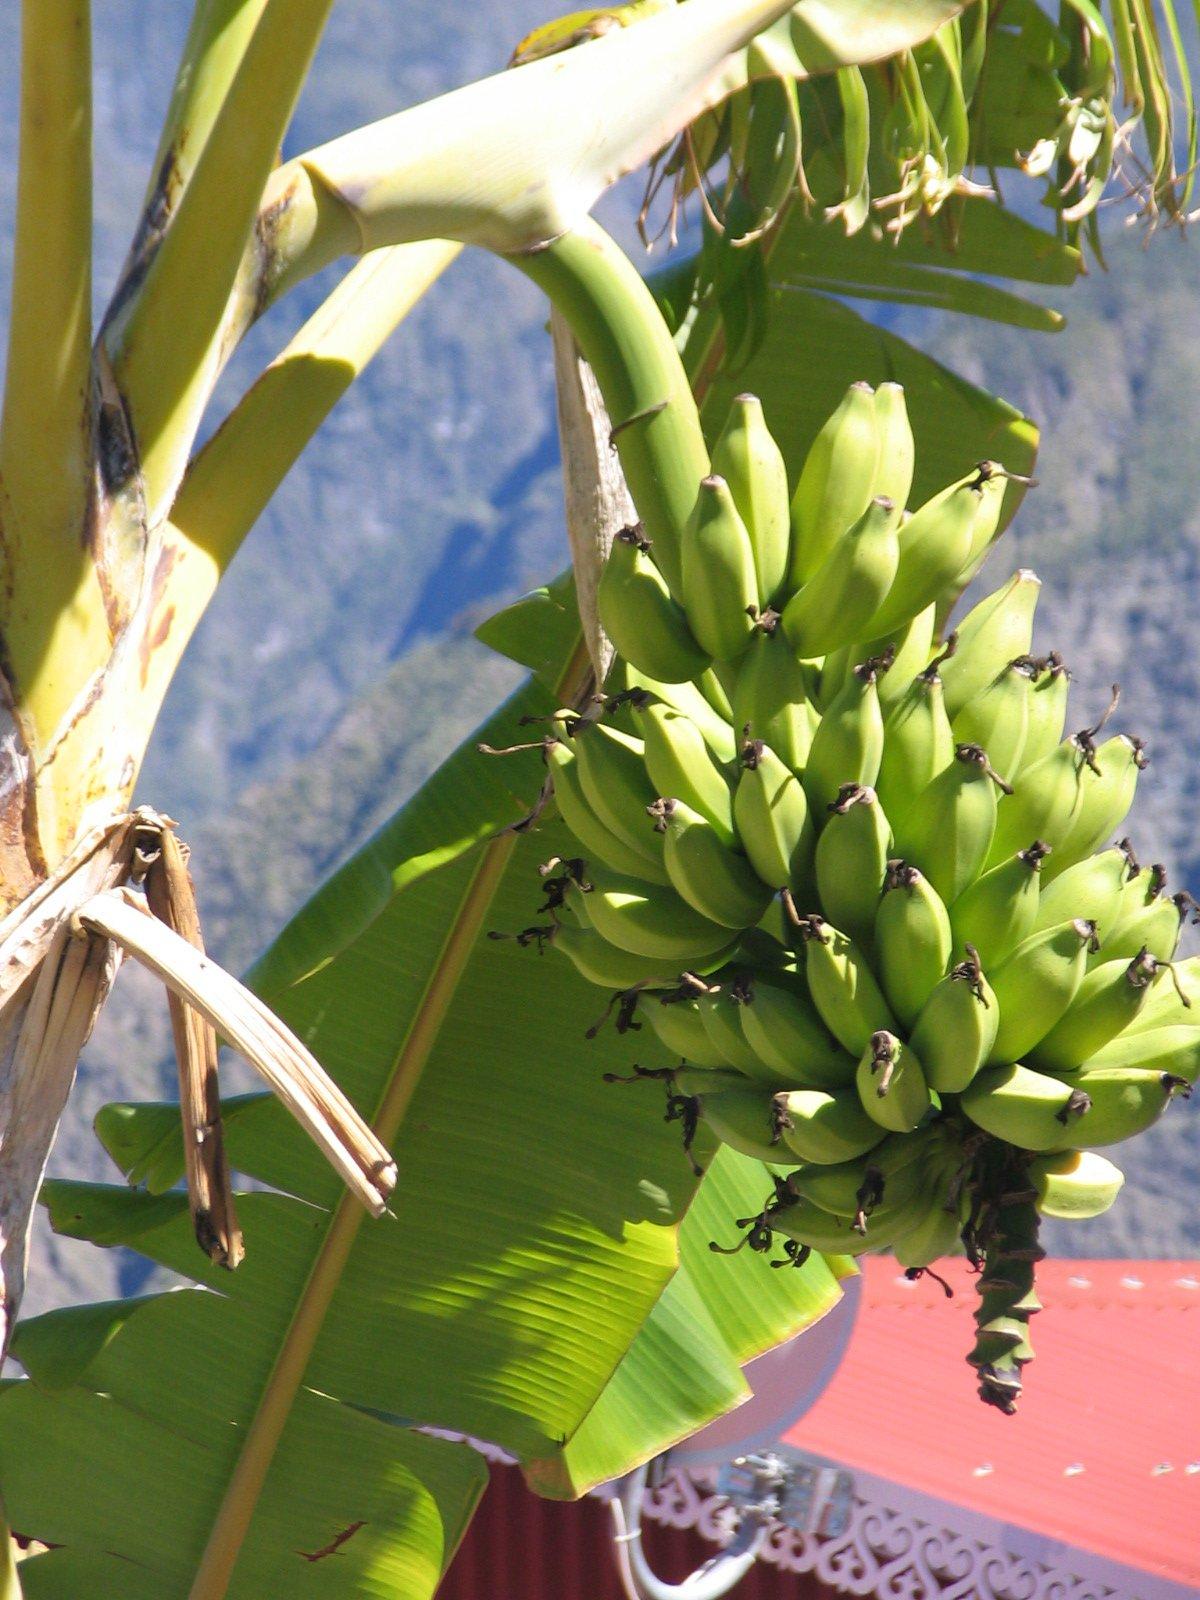 Image gallery le bananier - La maison du bananier ...